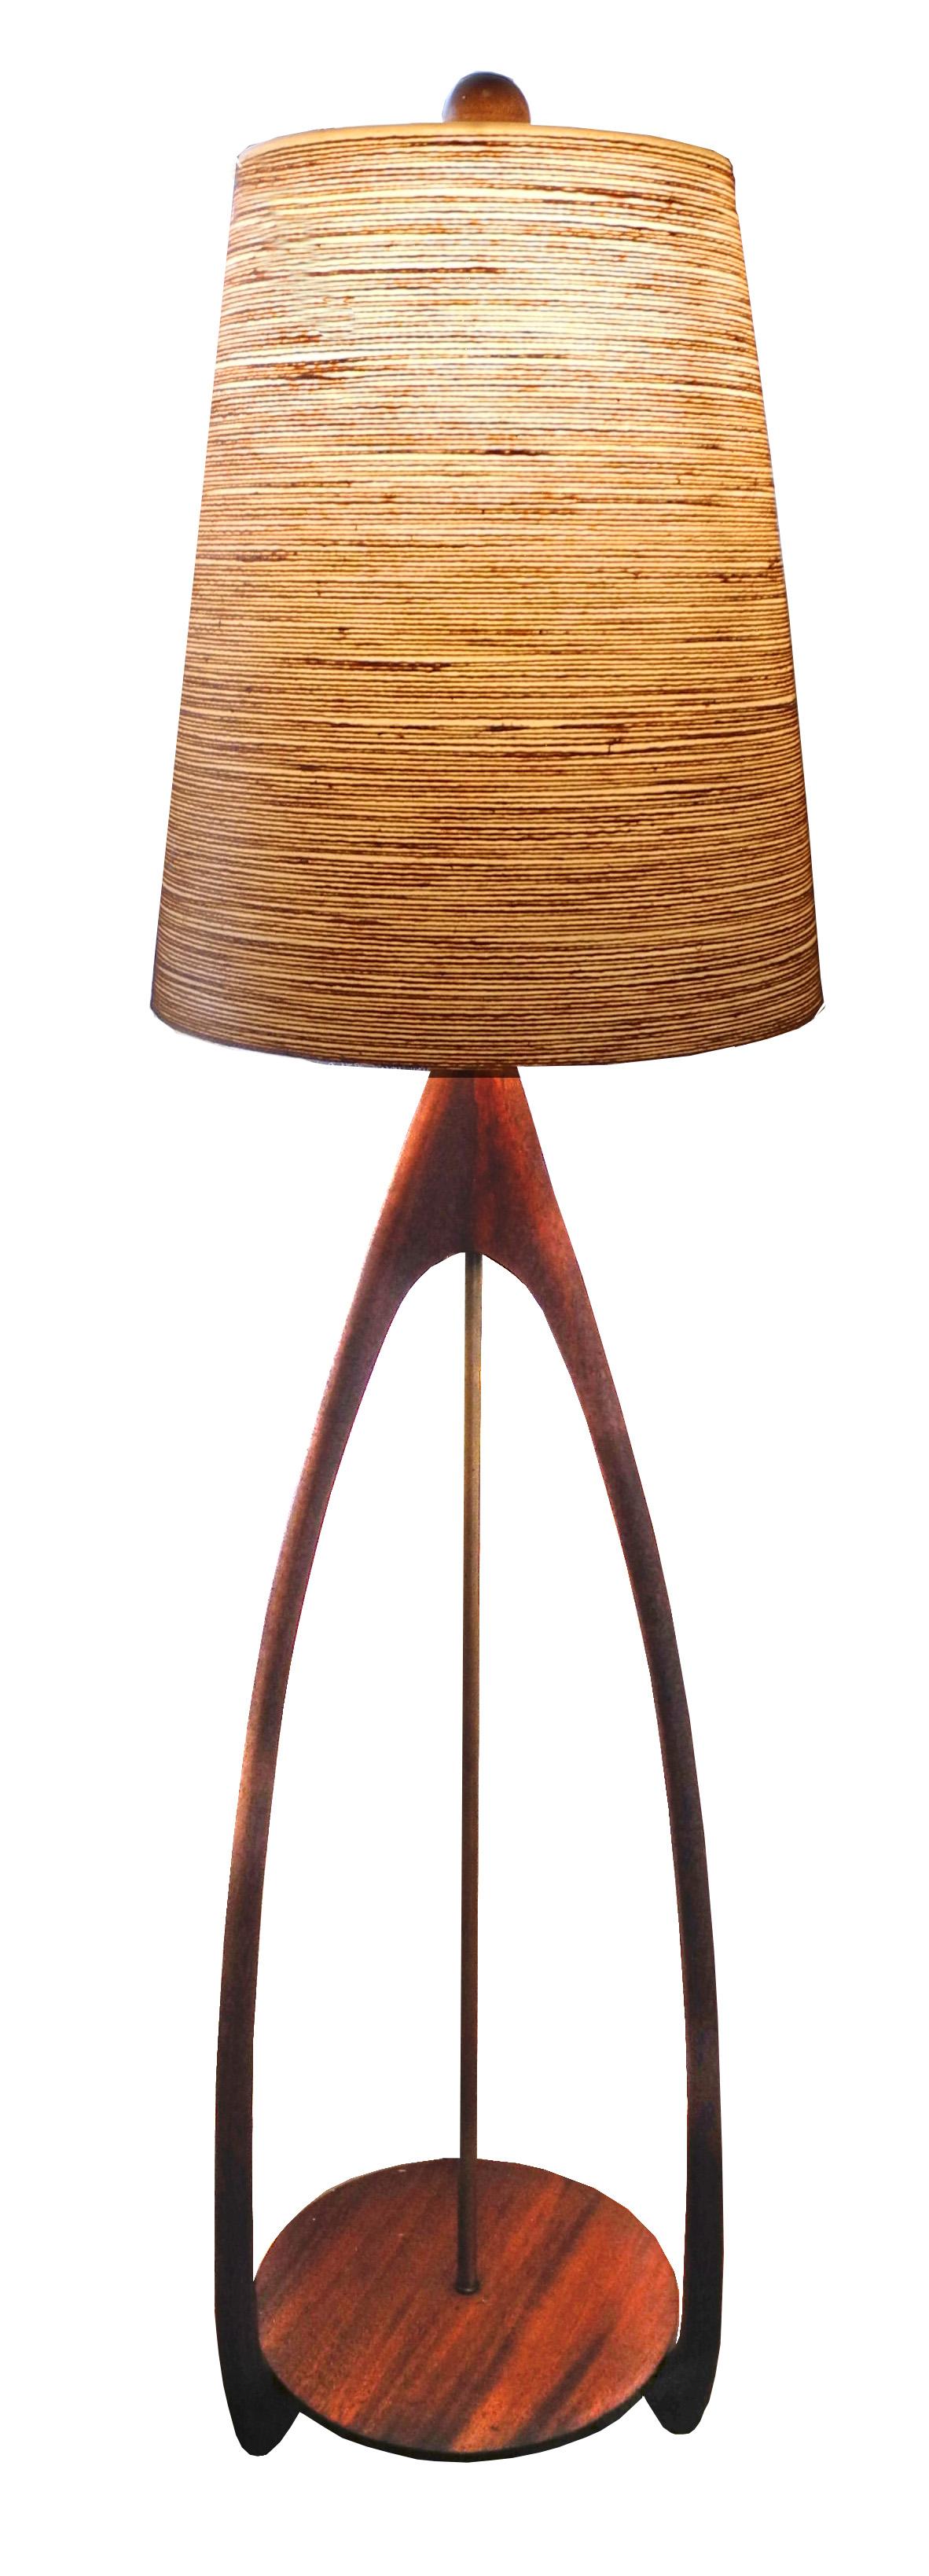 Teak Lamp Table Choice Image Coffee Table Design Ideas : teak floor lamp photo 10 from geotapseo.com size 1182 x 3277 jpeg 605kB